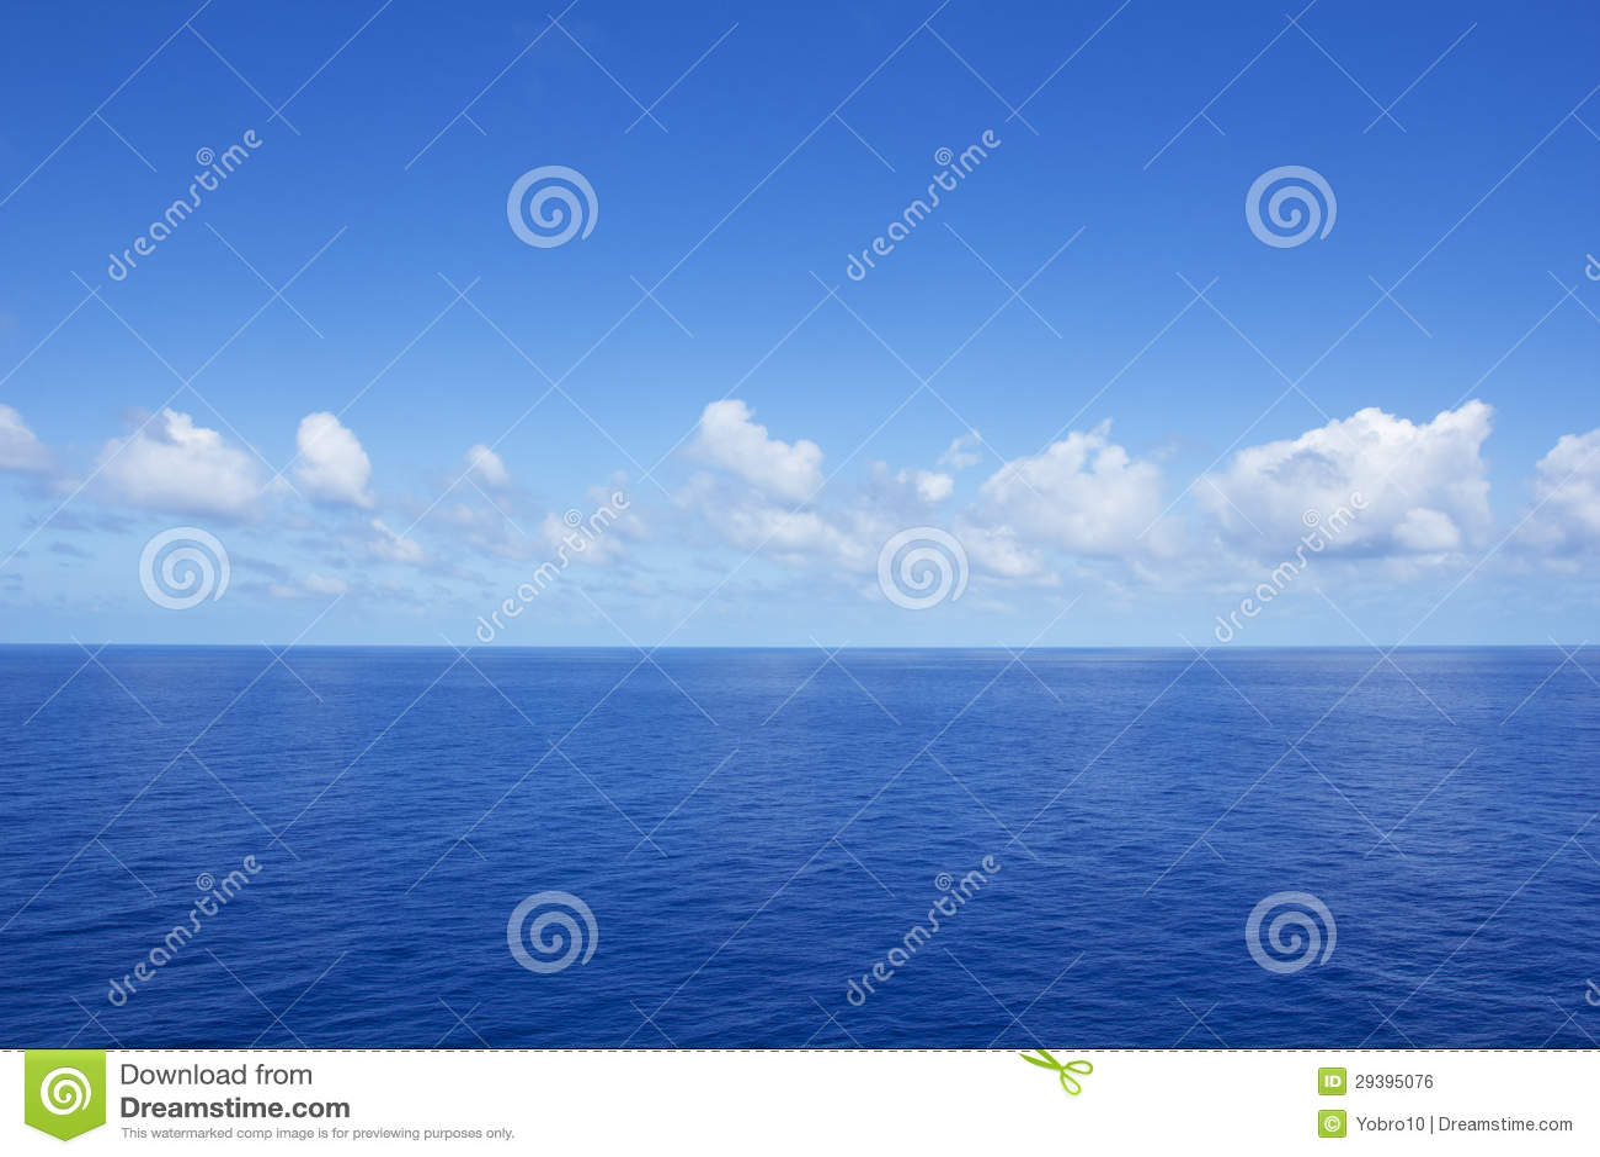 Calm Vibrant Blue Ocean